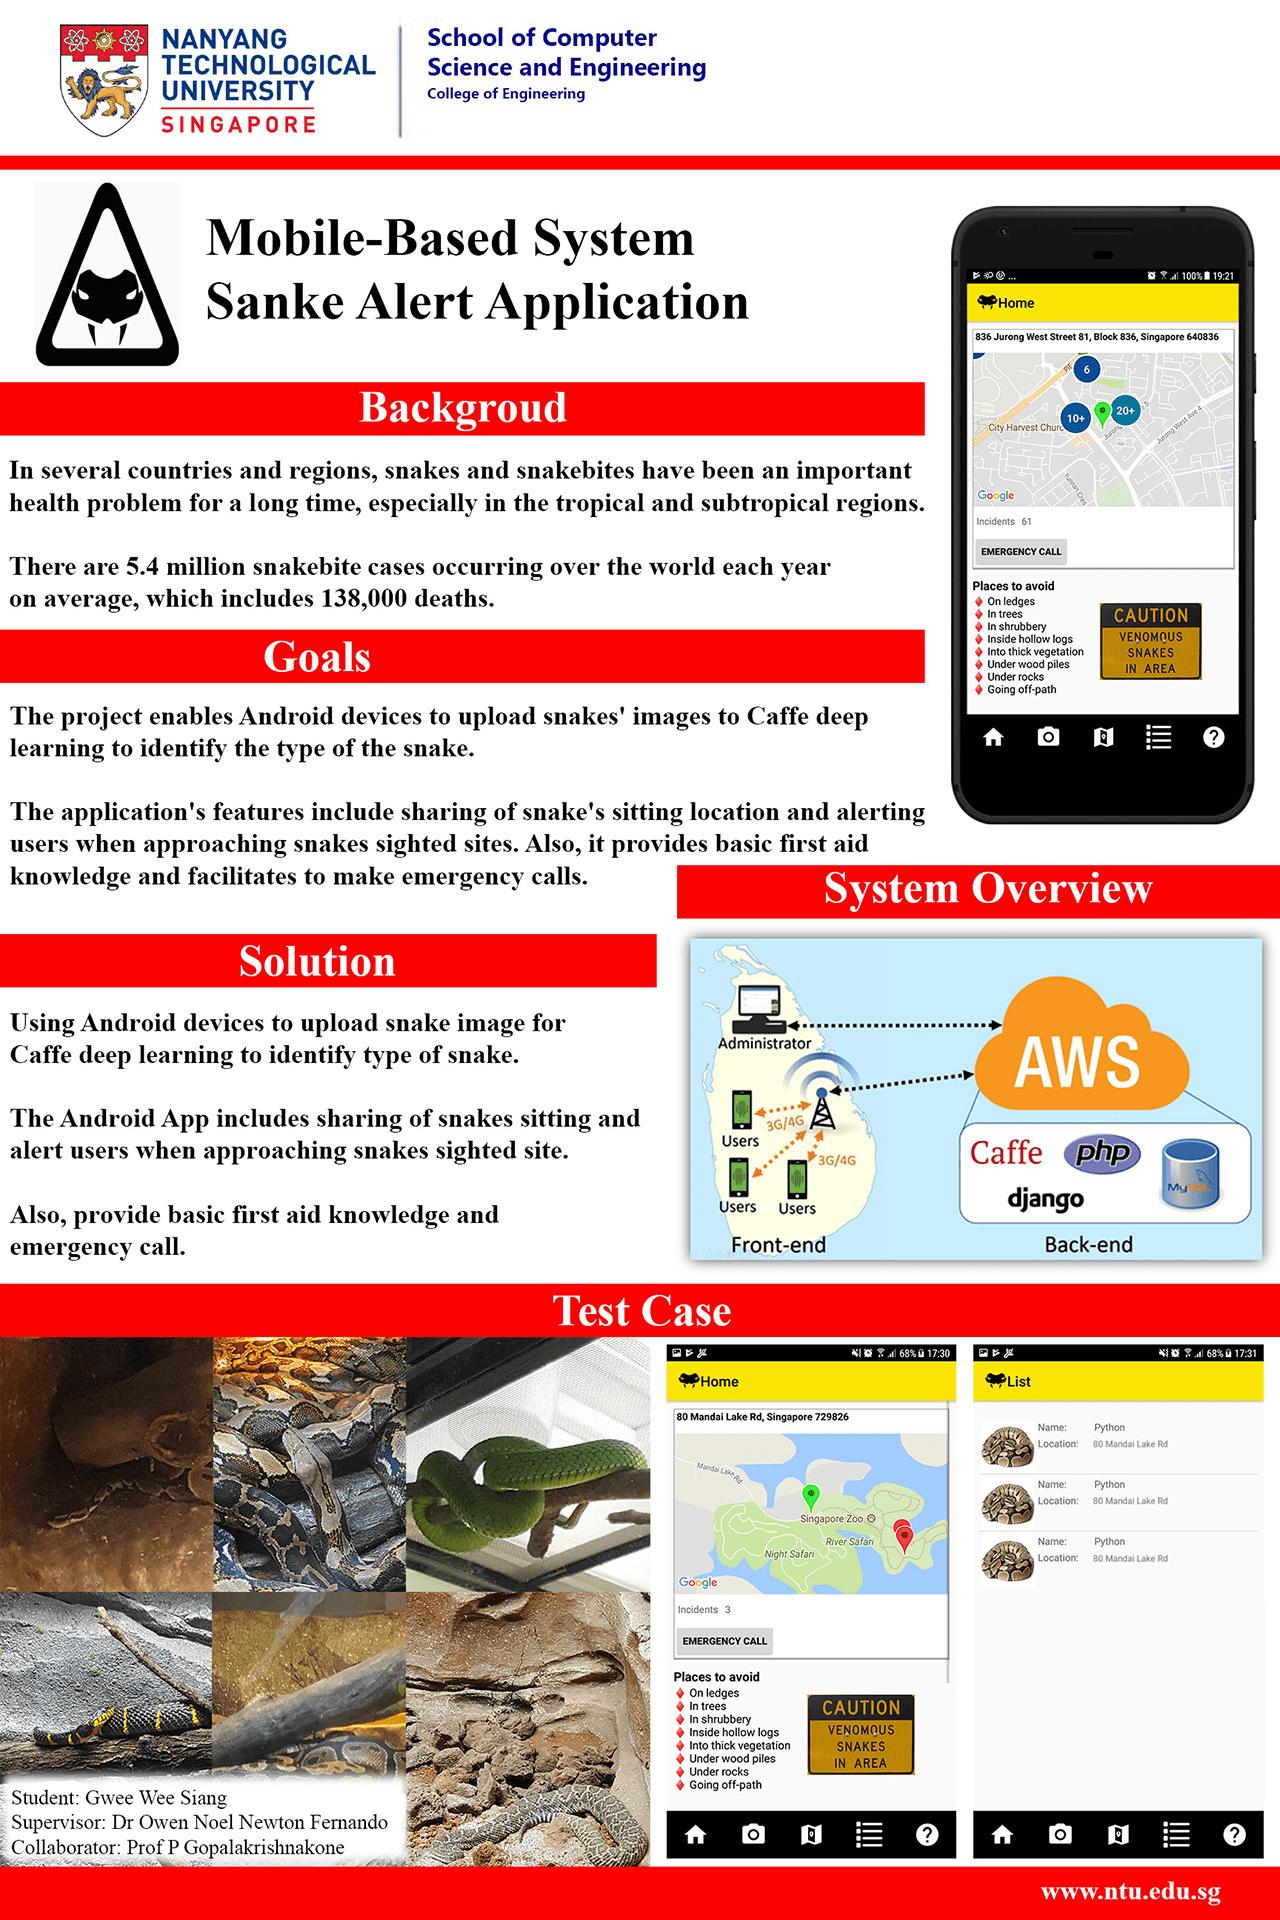 Mobile-based system: Snake alert application